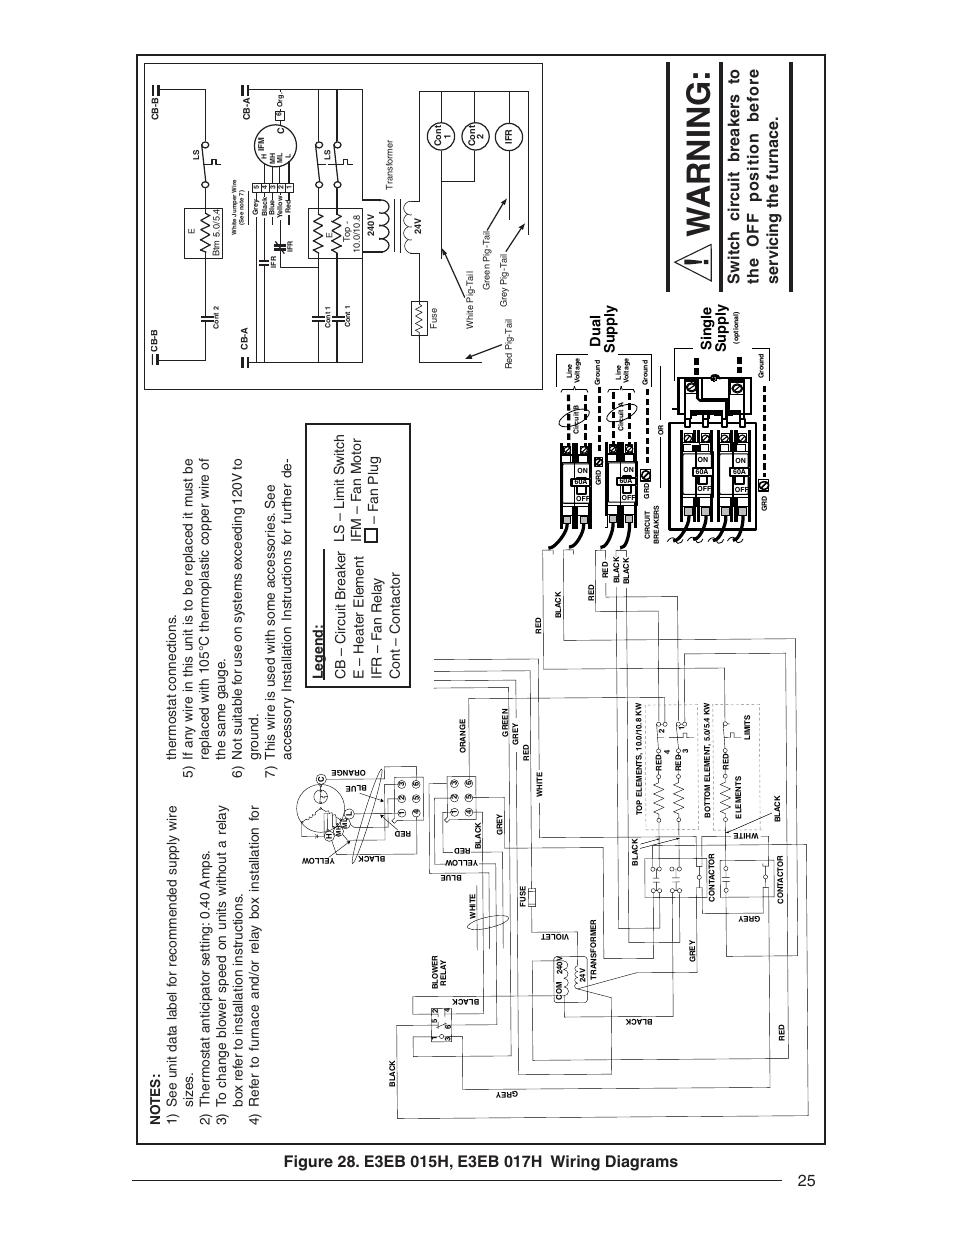 nordyne intertherm wiring diagram 2007 f250 fuse box warning, single suppl y, dual y | e3 series user manual page 25 / 32